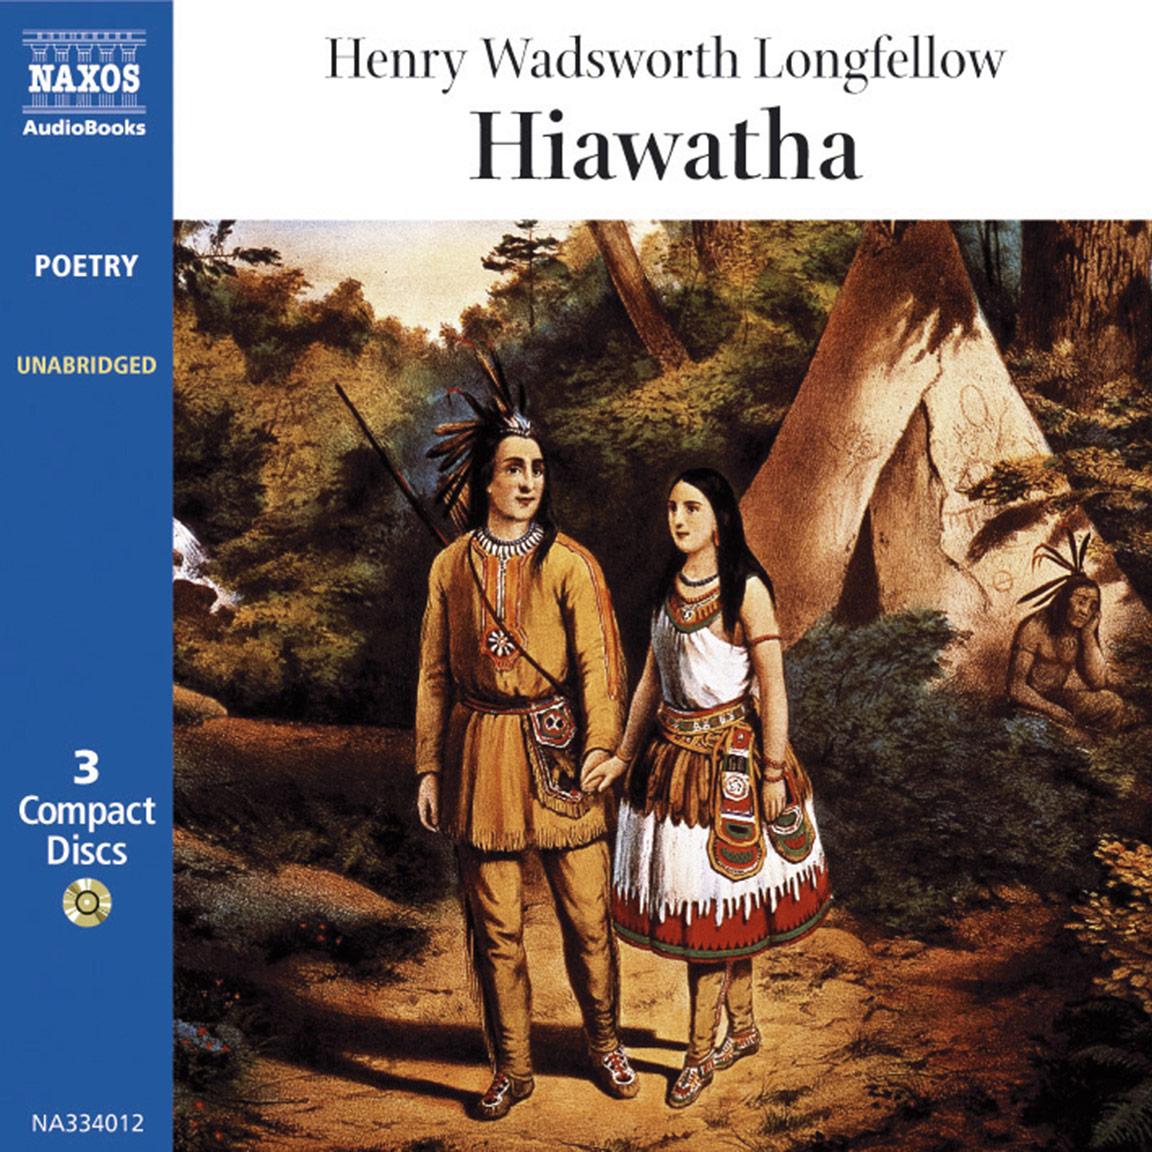 Hiawatha (unabridged)